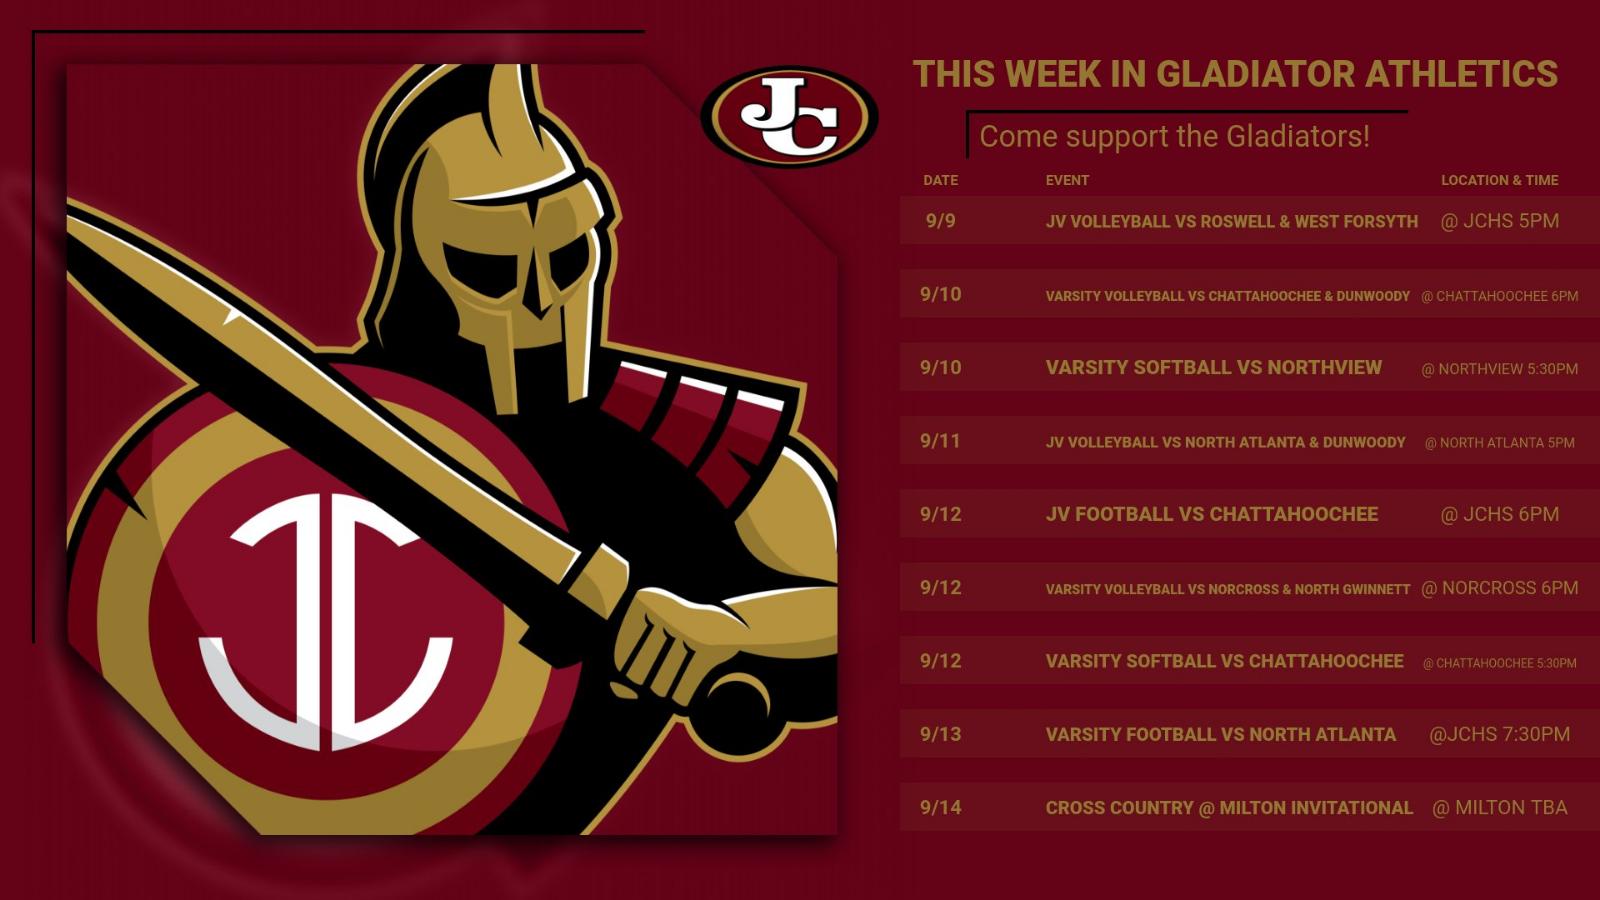 This week in Gladiator Athletics